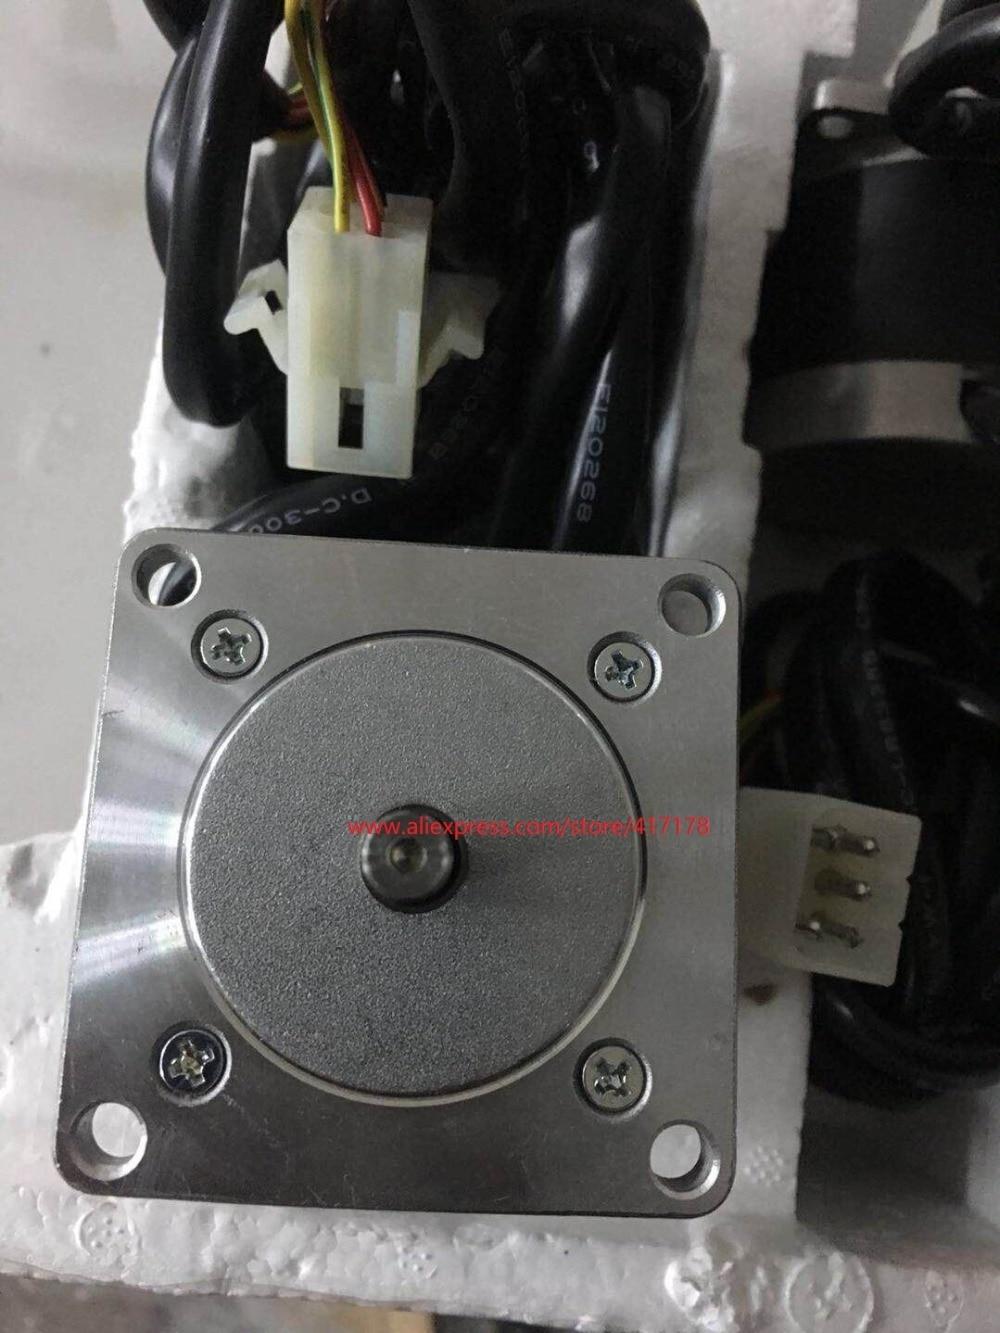 Lonati Goal Series G615 G615D Socks Machine Use Stepping Motor D4840444